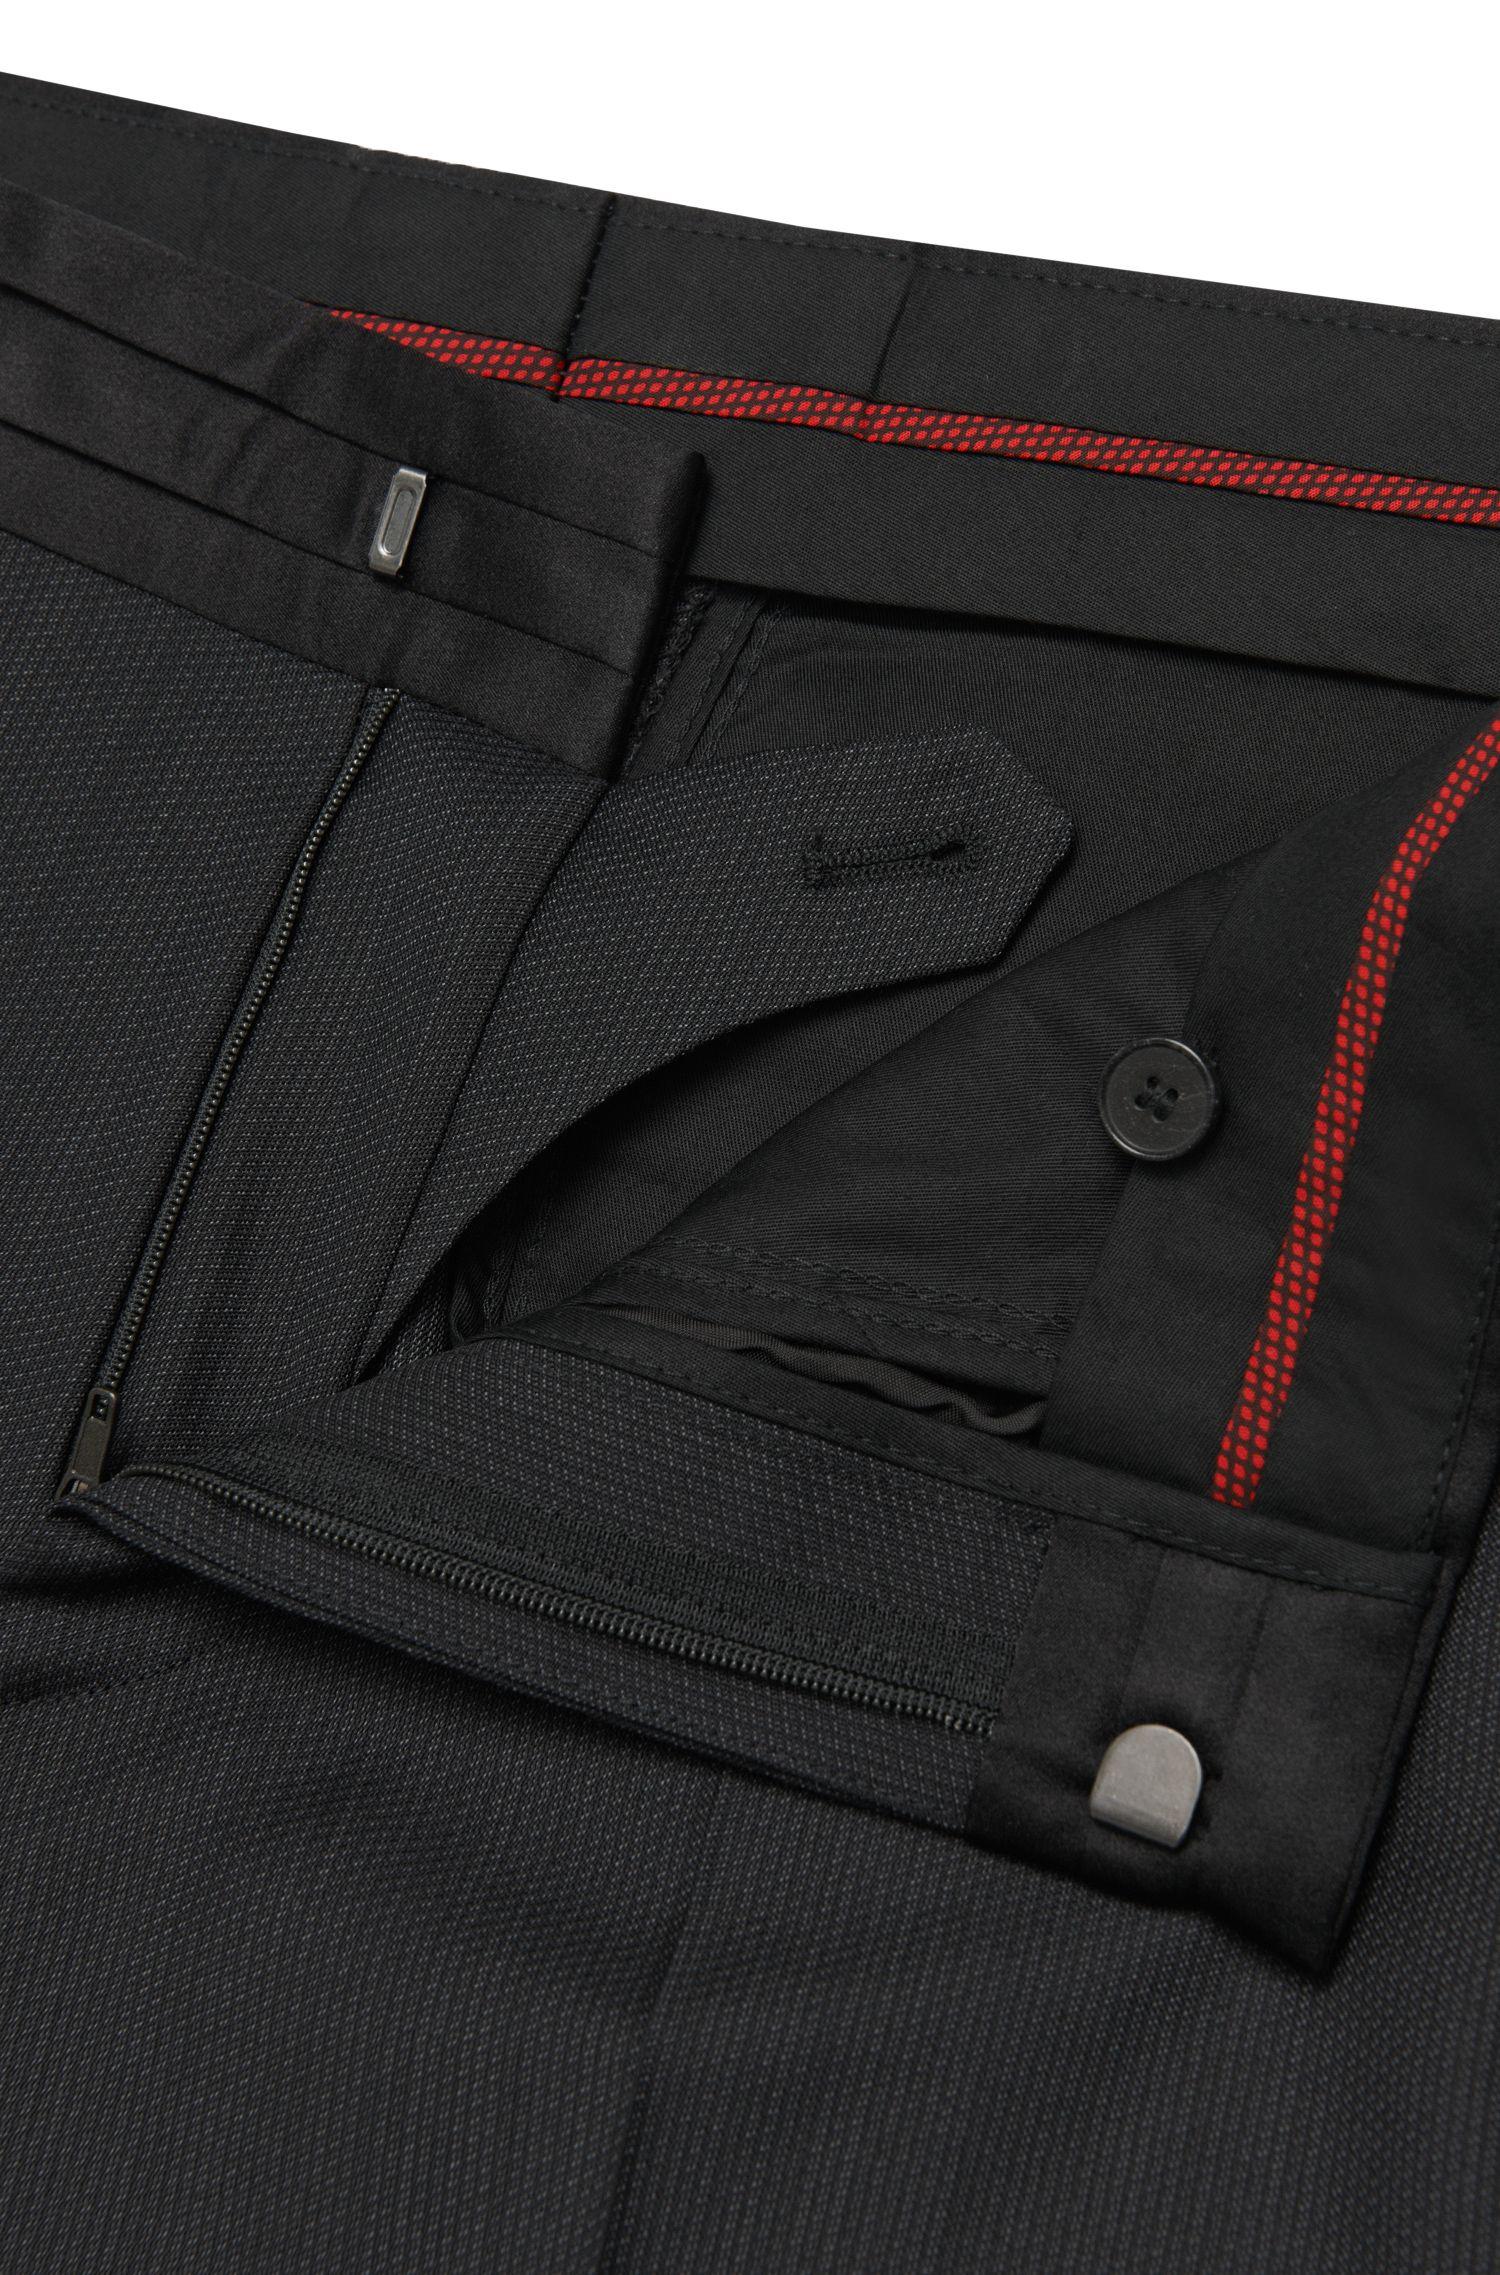 Super 110 Virgin Wool Tuxedo, Extra-Slim Fit   Anros/Himans